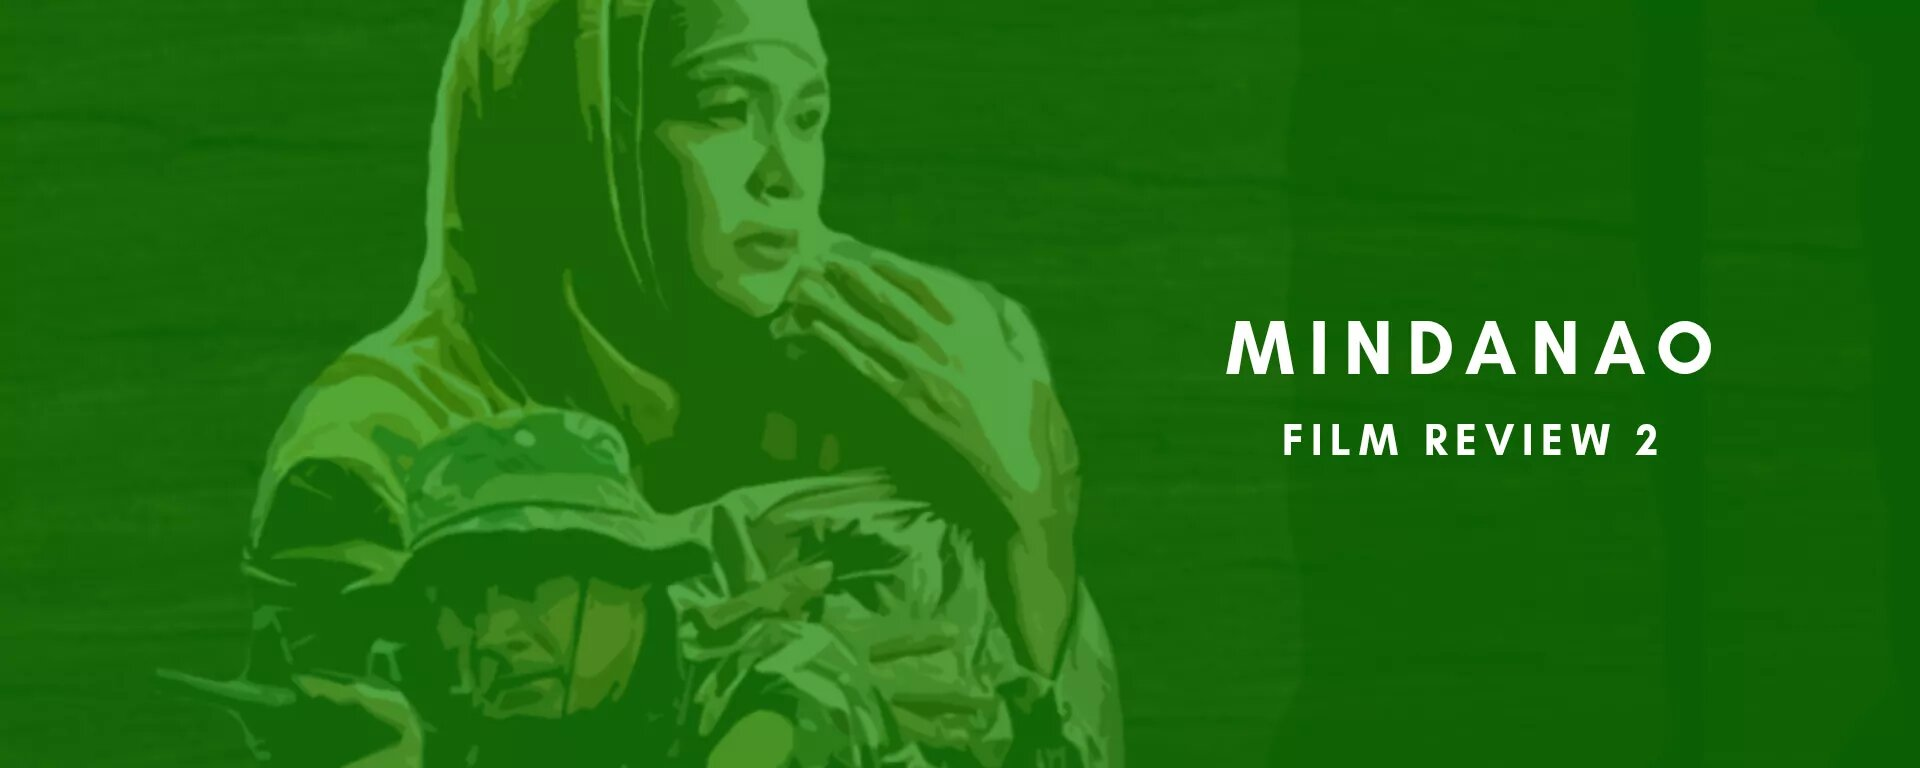 mindanao film